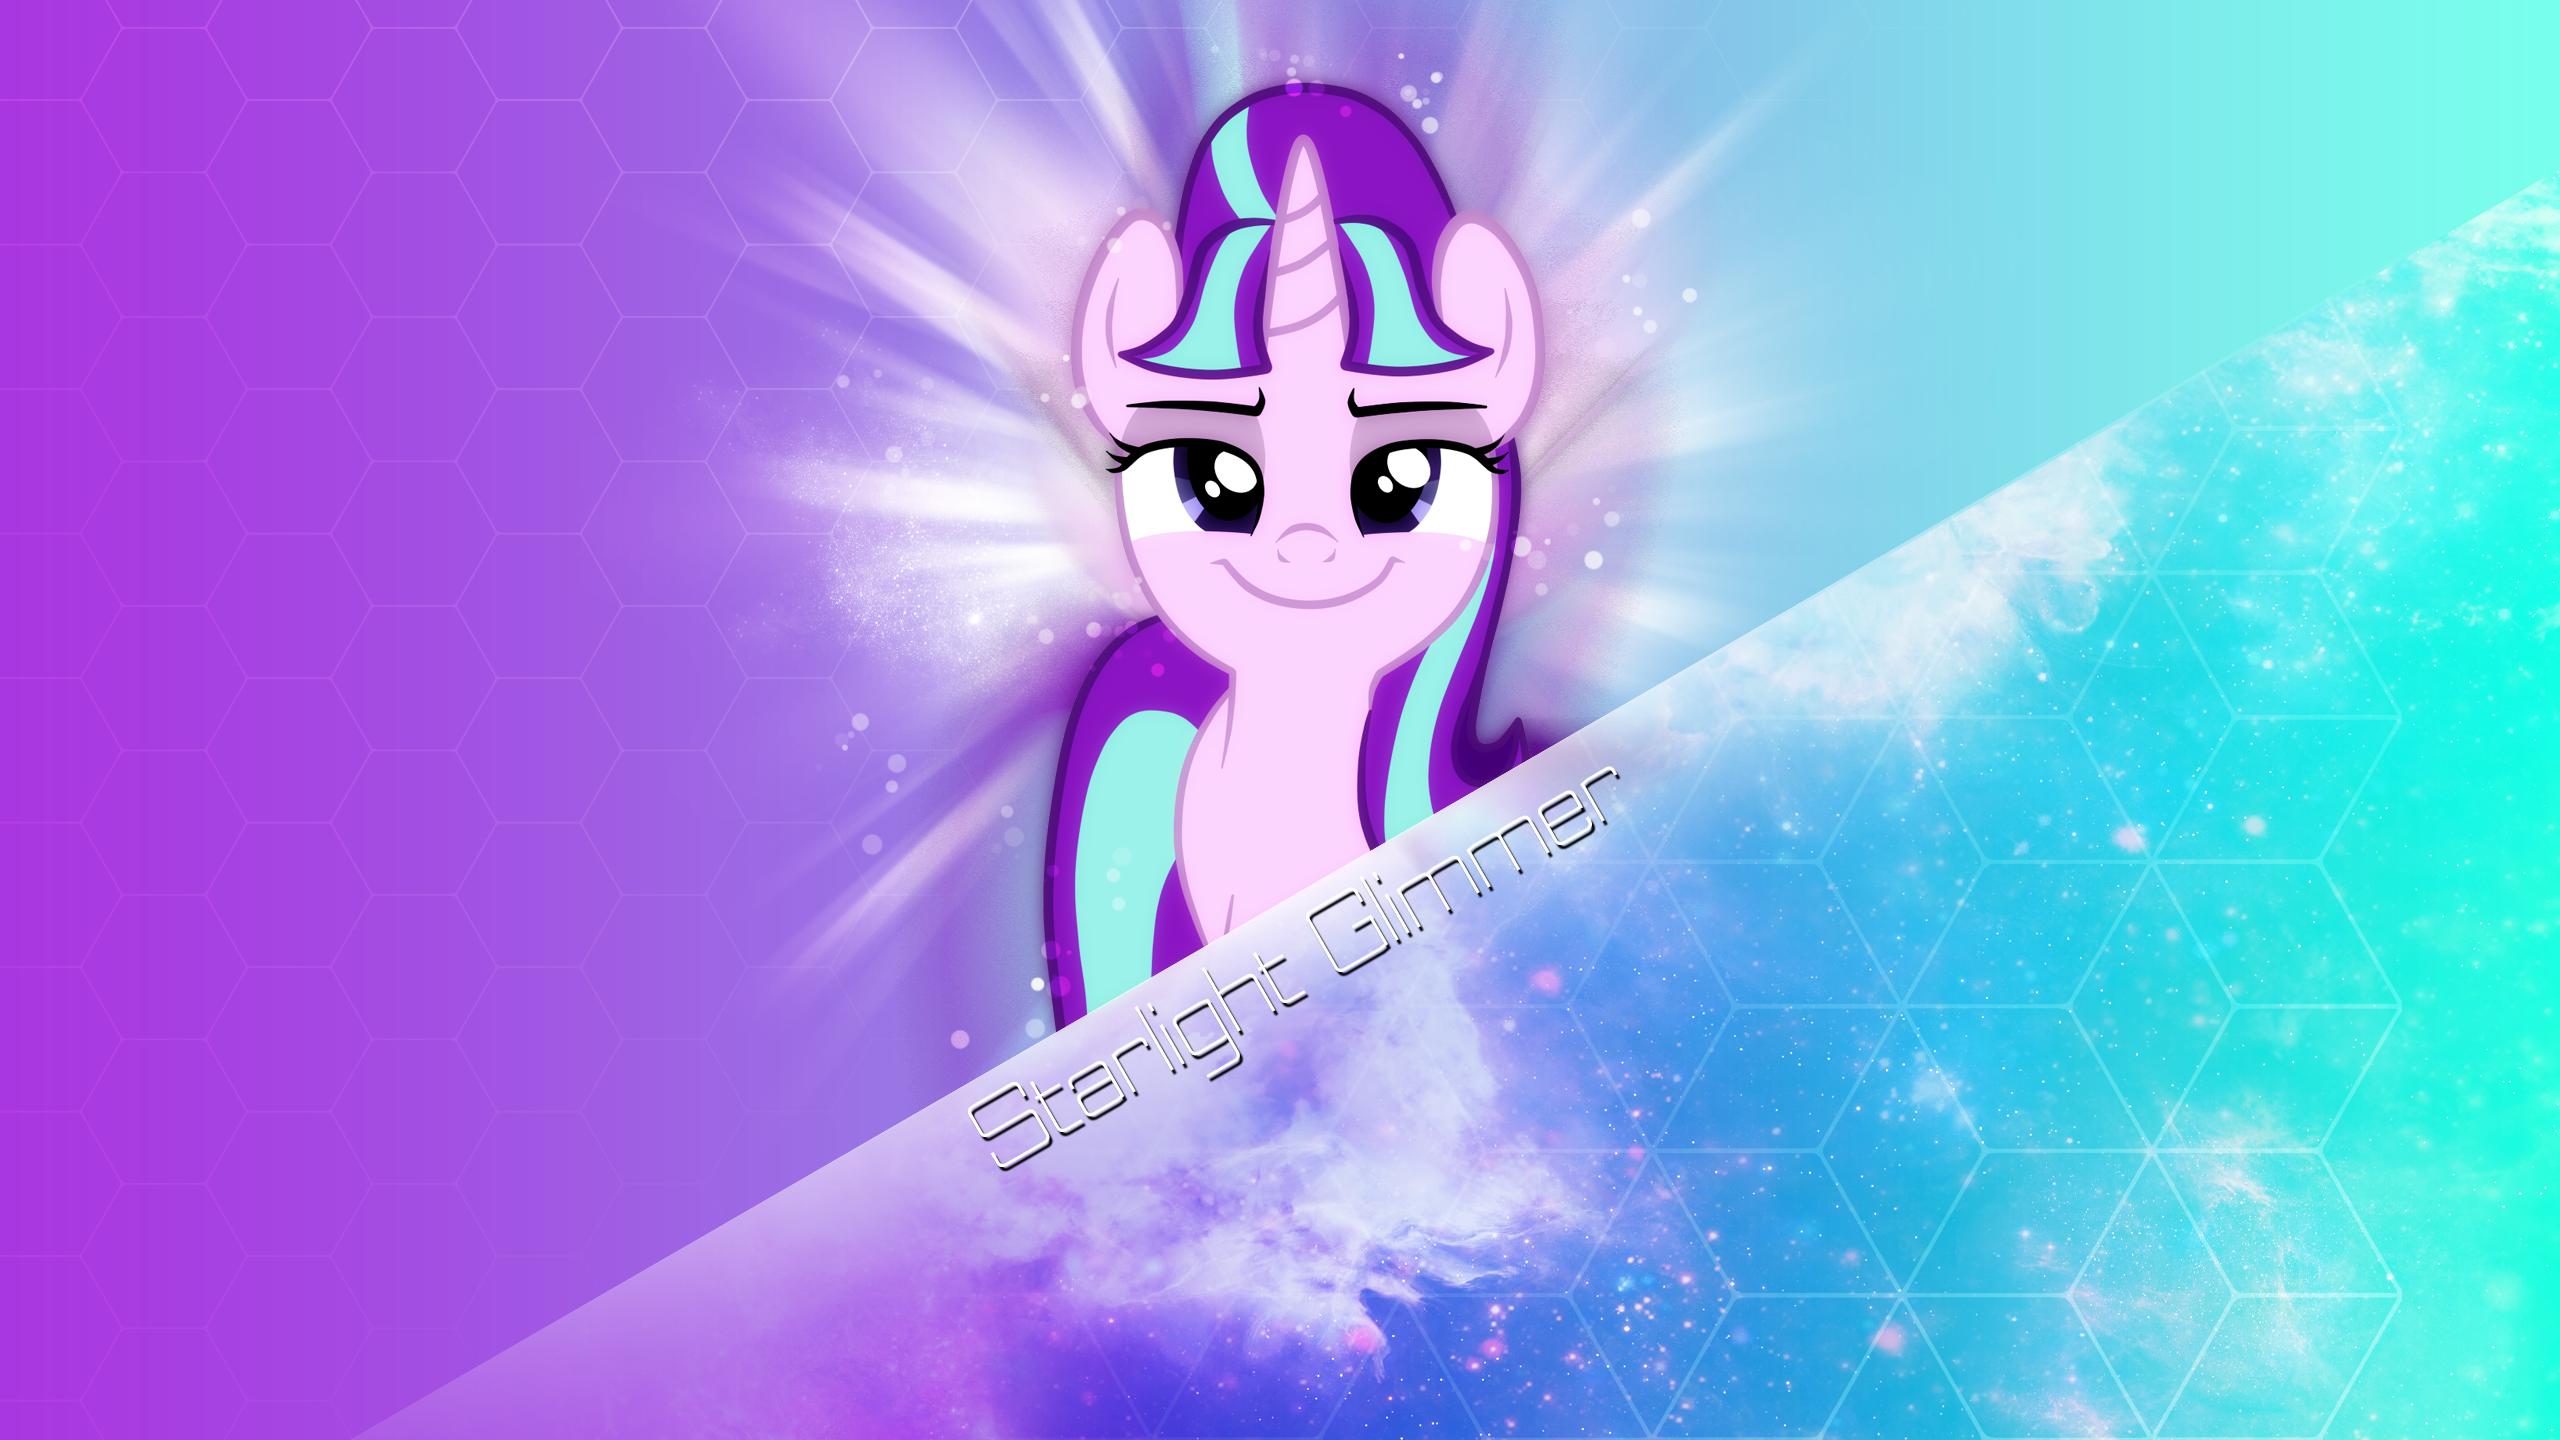 Starlight Glimmer Wallpaper . 2560 x 1440 HD